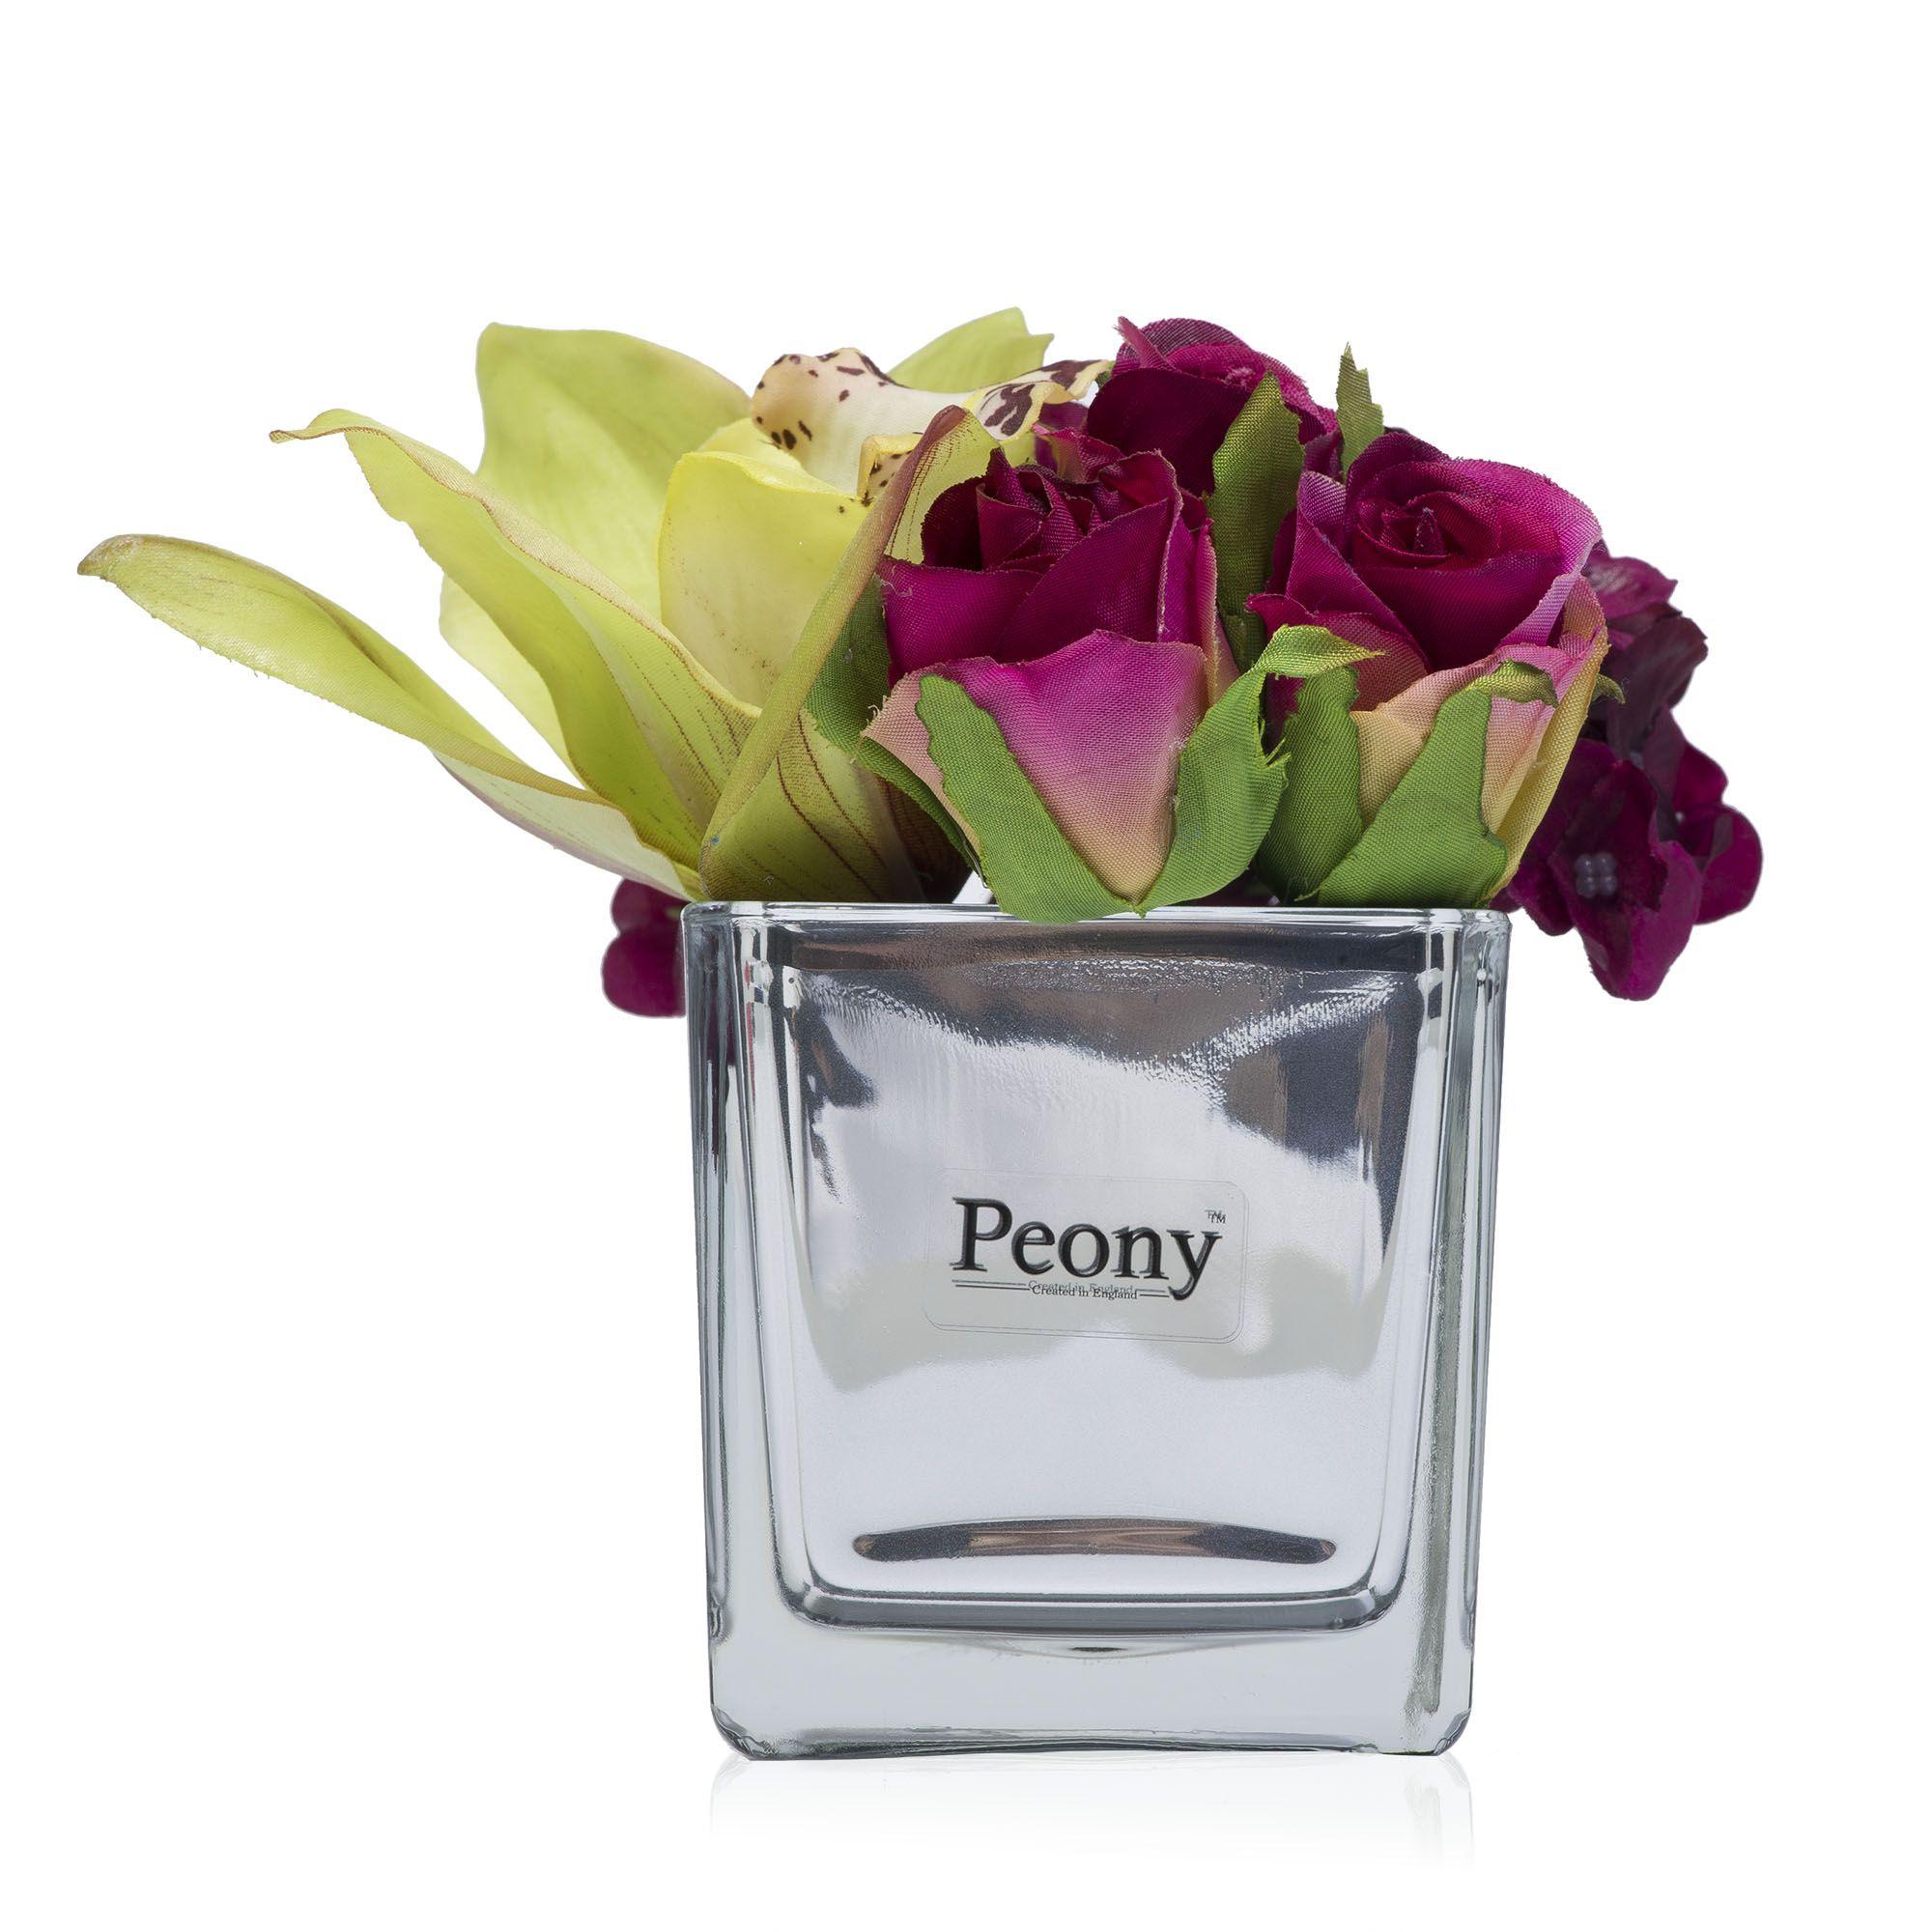 Ortensie orchidee e rose in vaso a specchio qvc italia for Ortensie in vaso